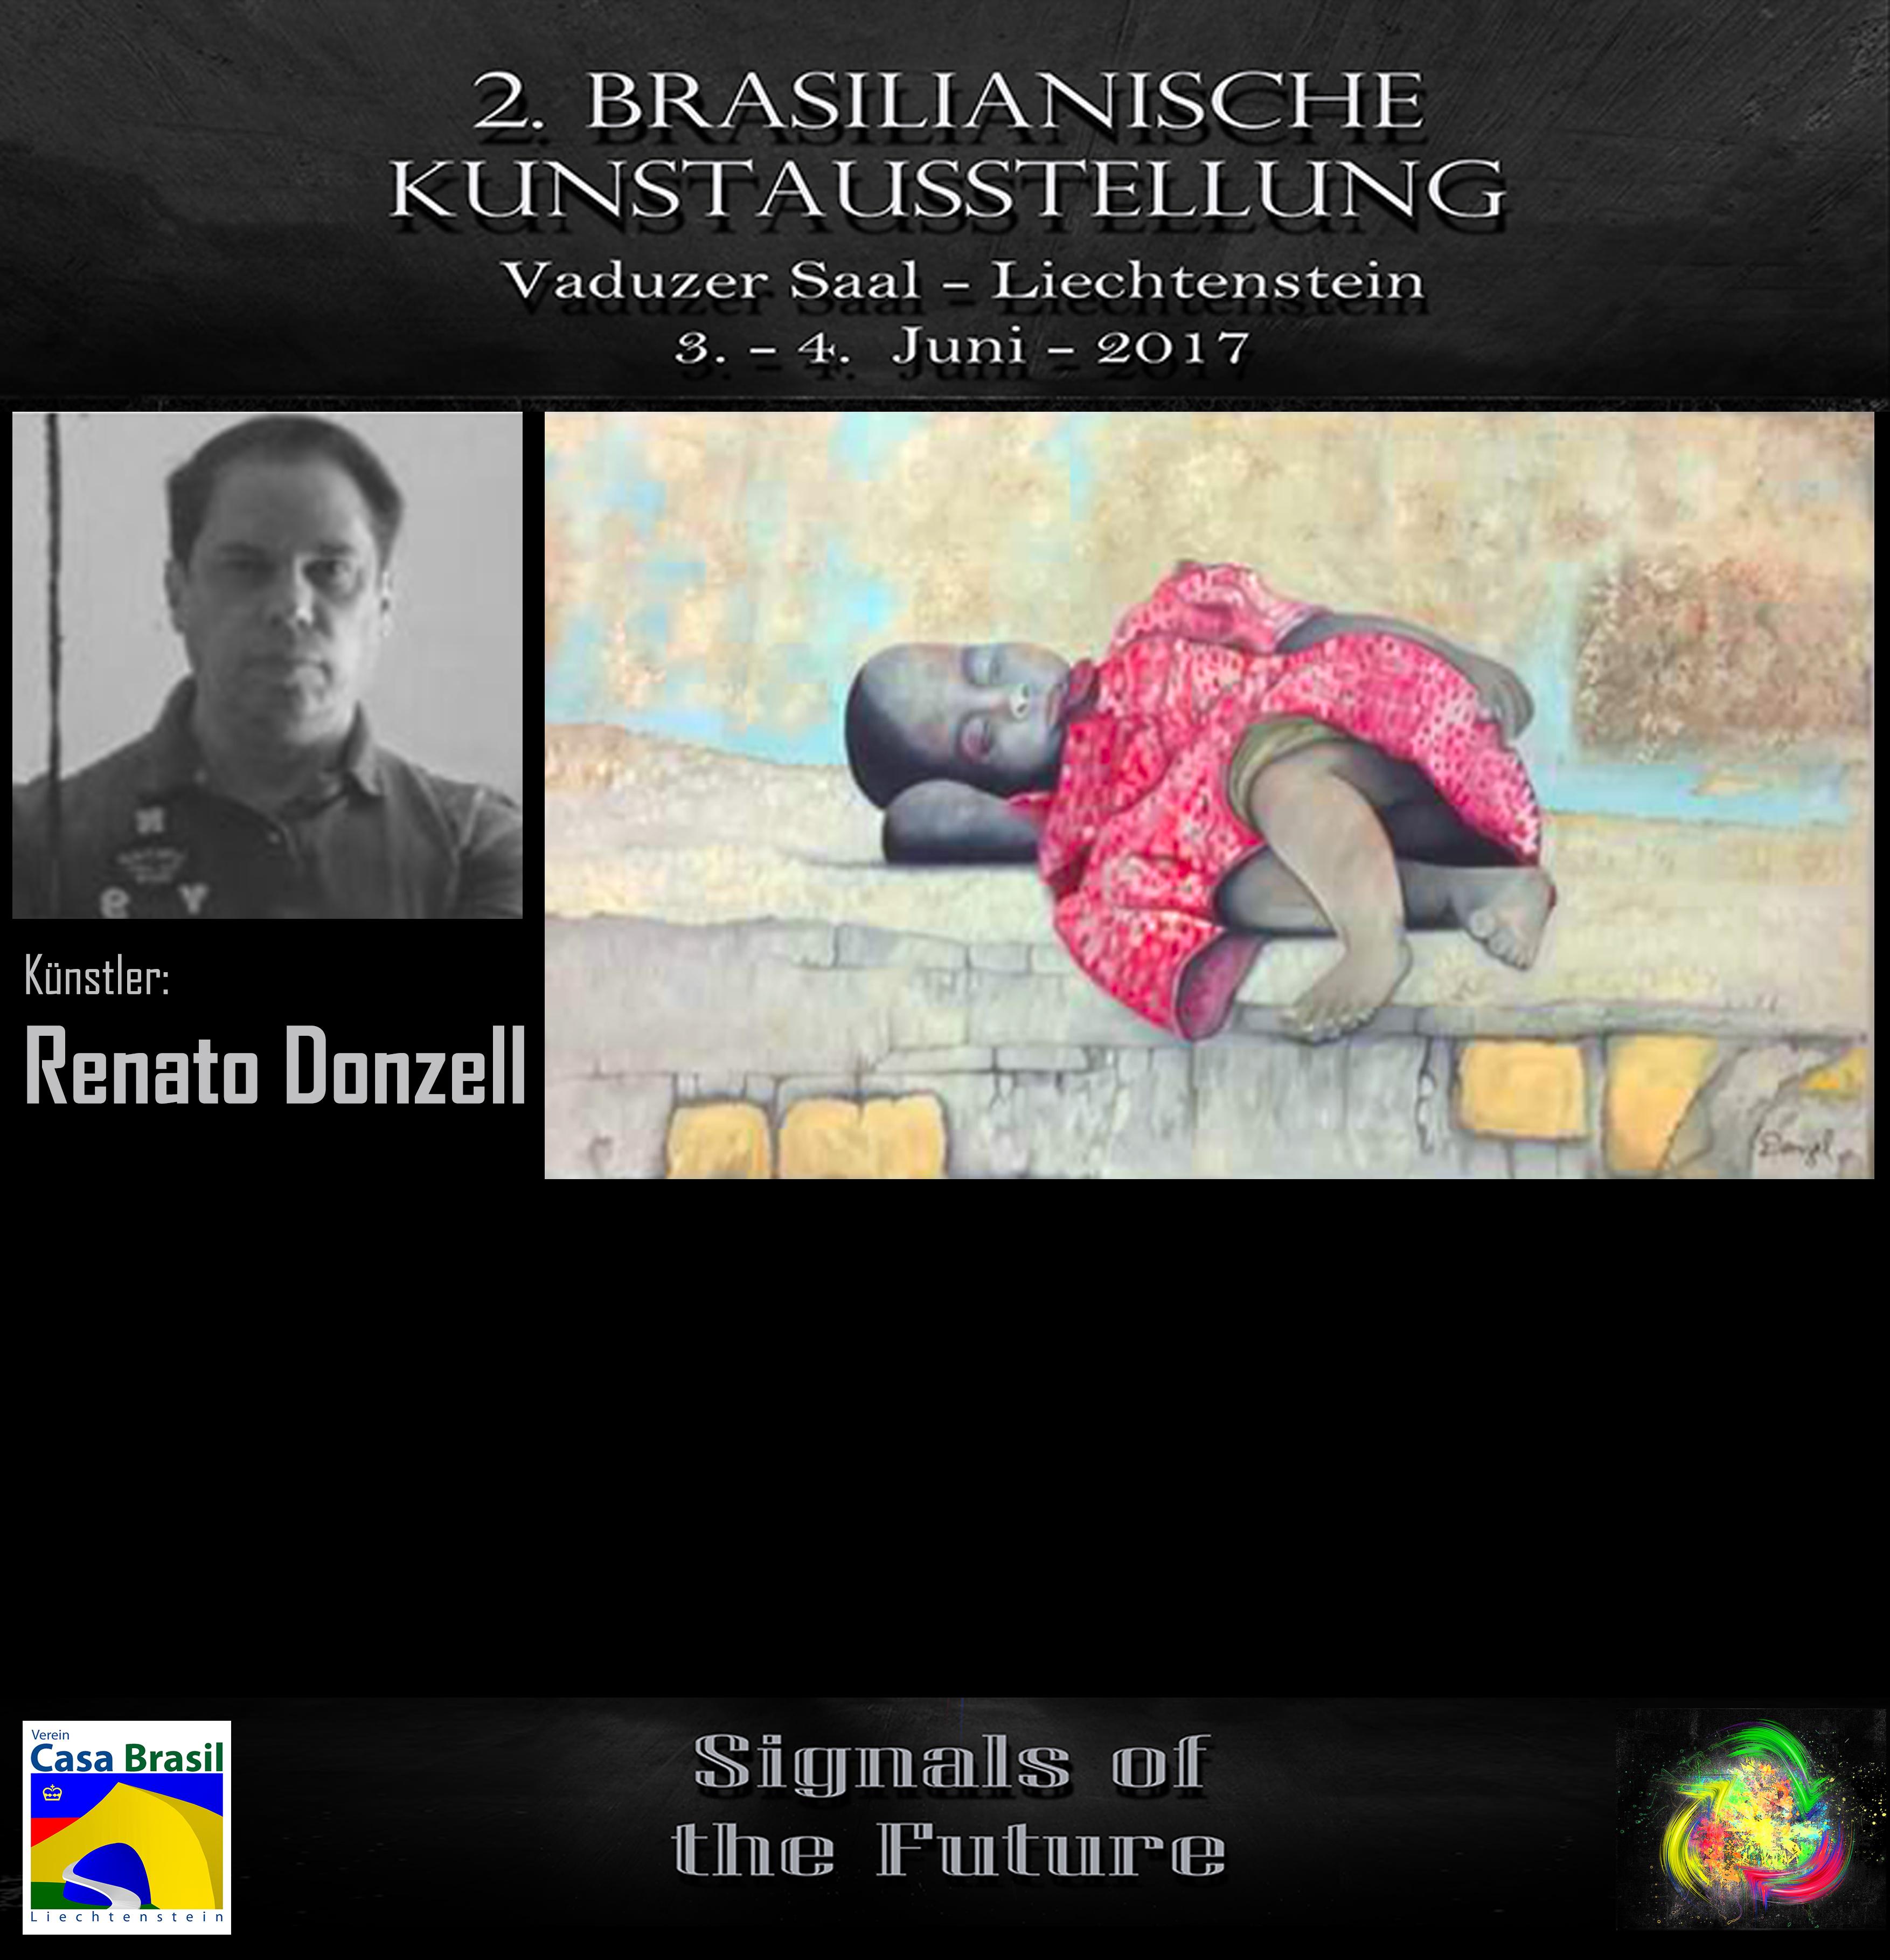 Renato Donzell